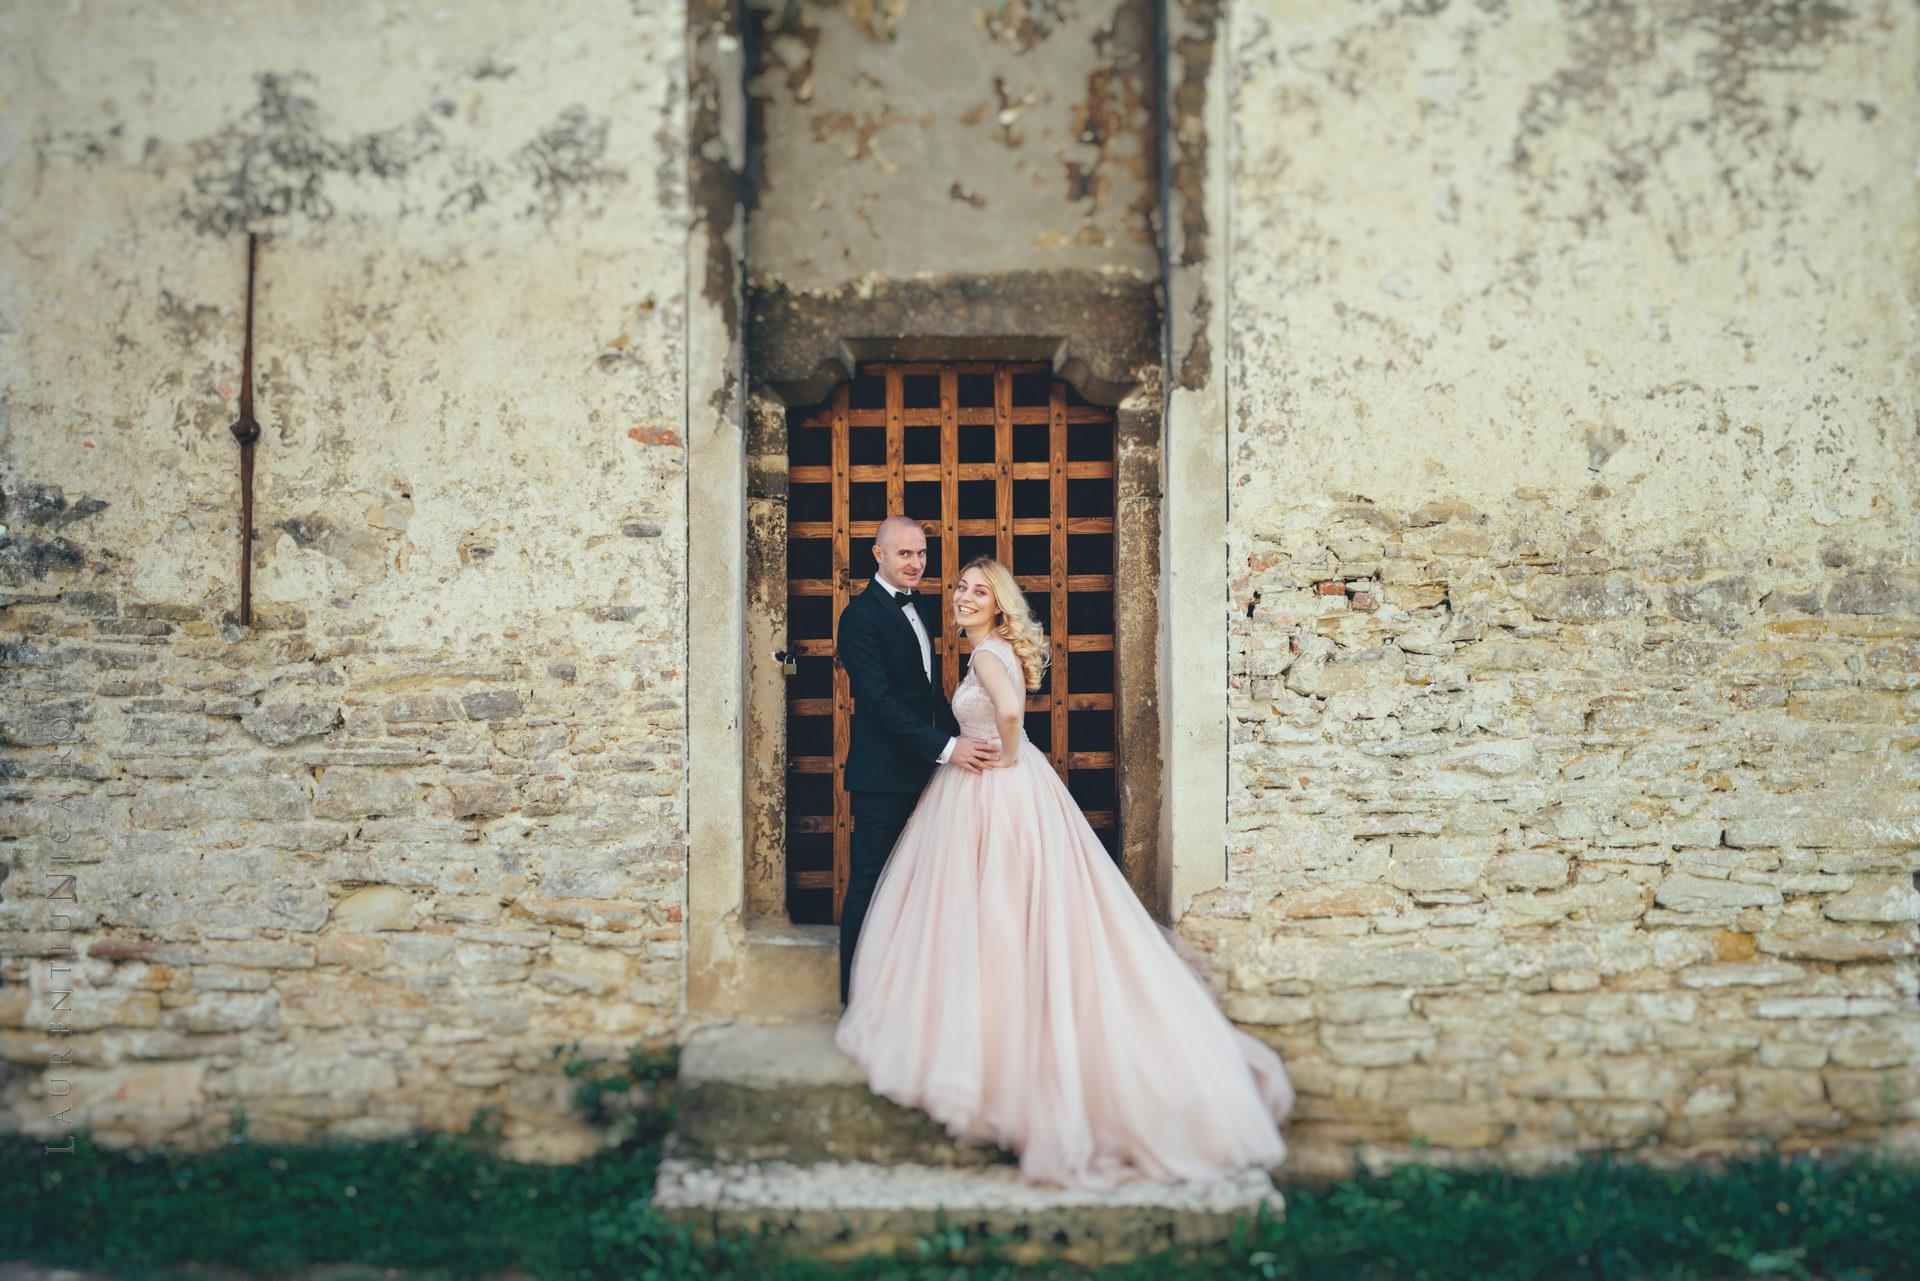 lavinia si adi fotograf laurentiu nica sighisoara biertan 022 - Lavinia & Adi | Fotografii After Wedding | Sighisoara & Biertan